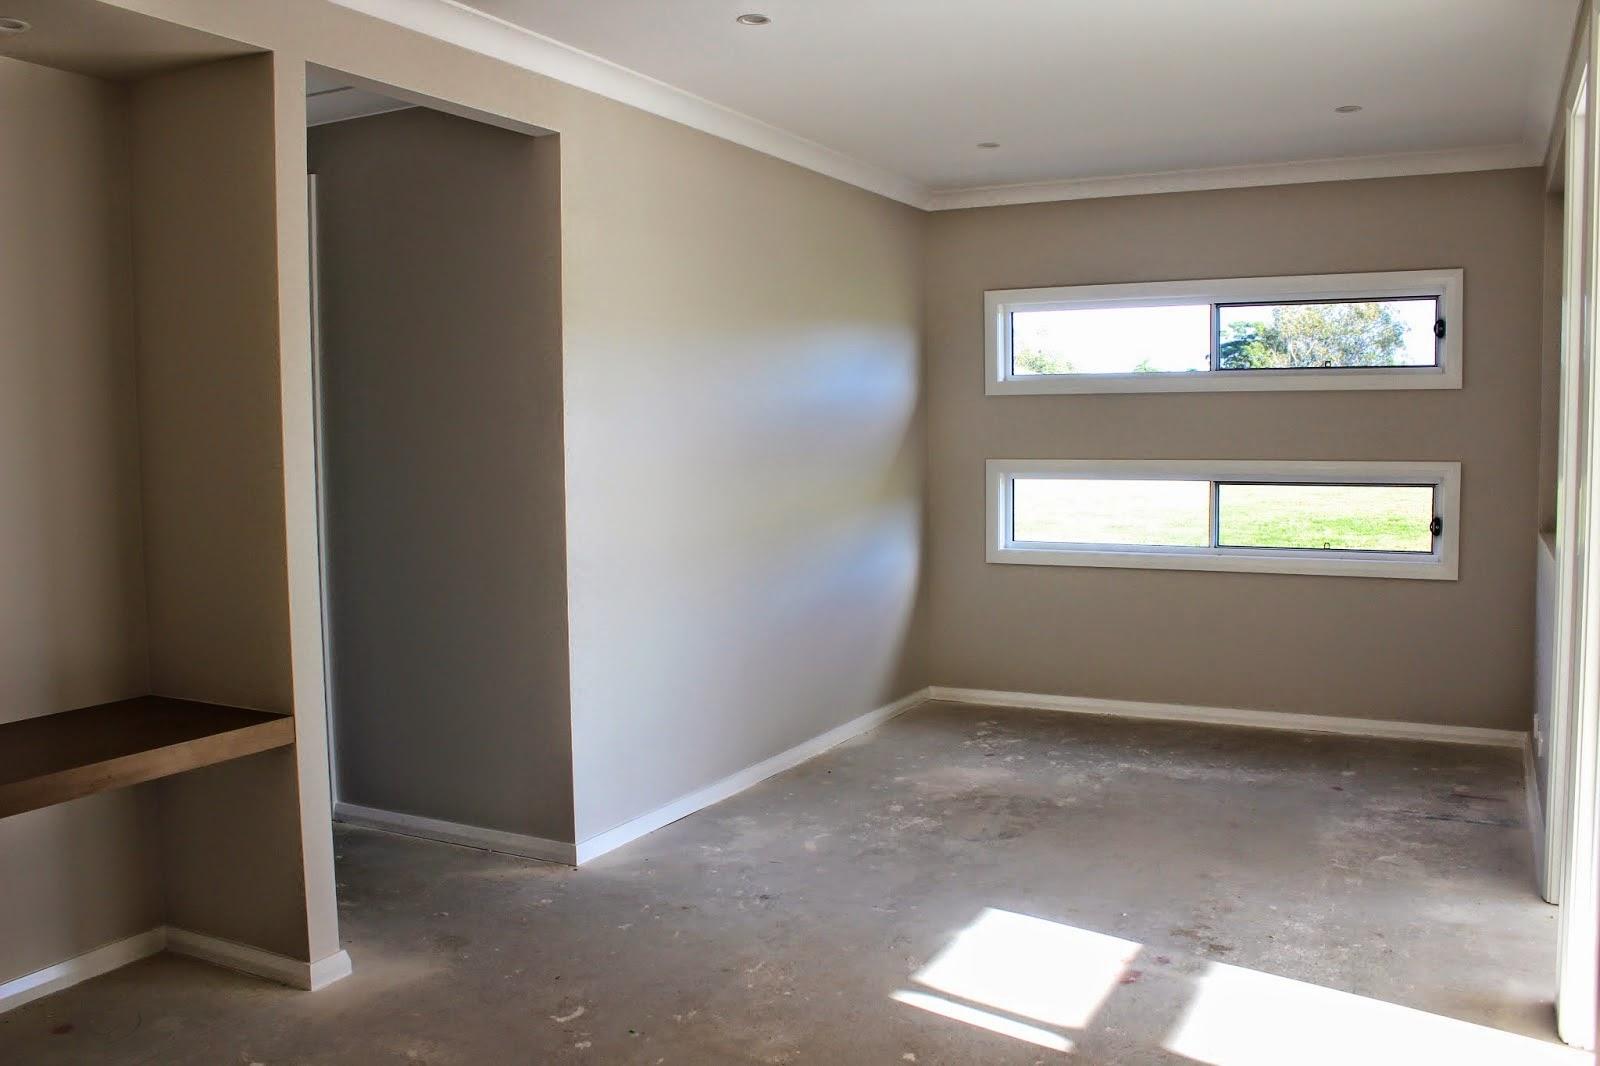 Taubmans interior paint review for Taubmans exterior paint colours